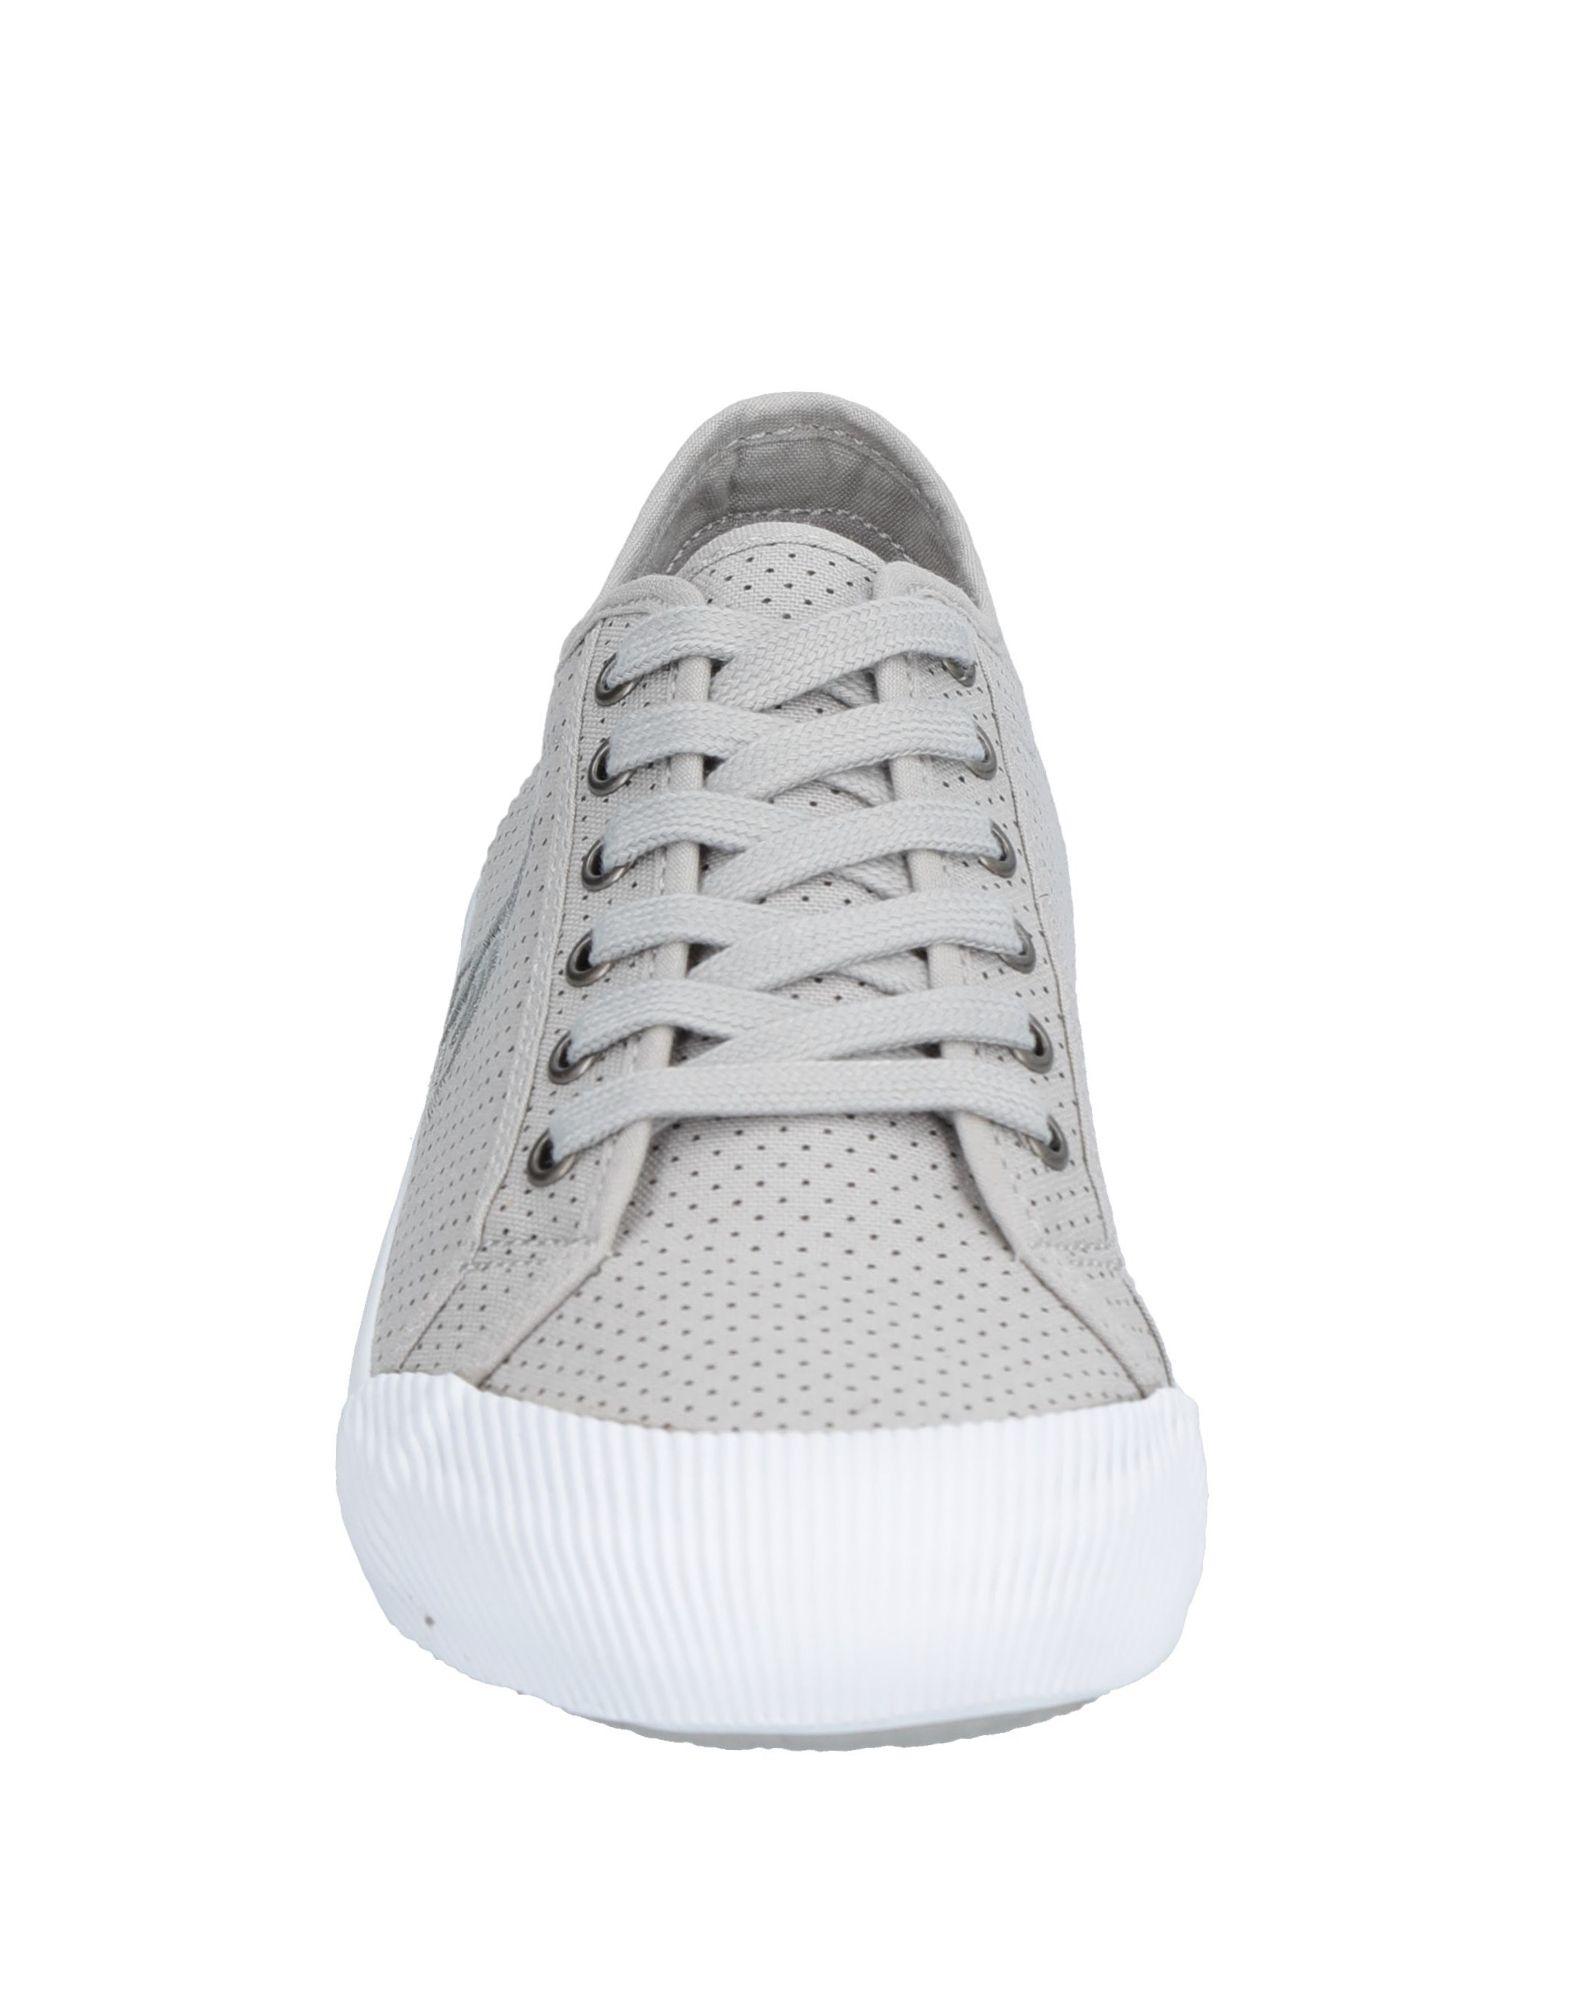 Le Coq Sportif Sneakers Damen Schuhe  11534471IU Neue Schuhe Damen 8fcecd